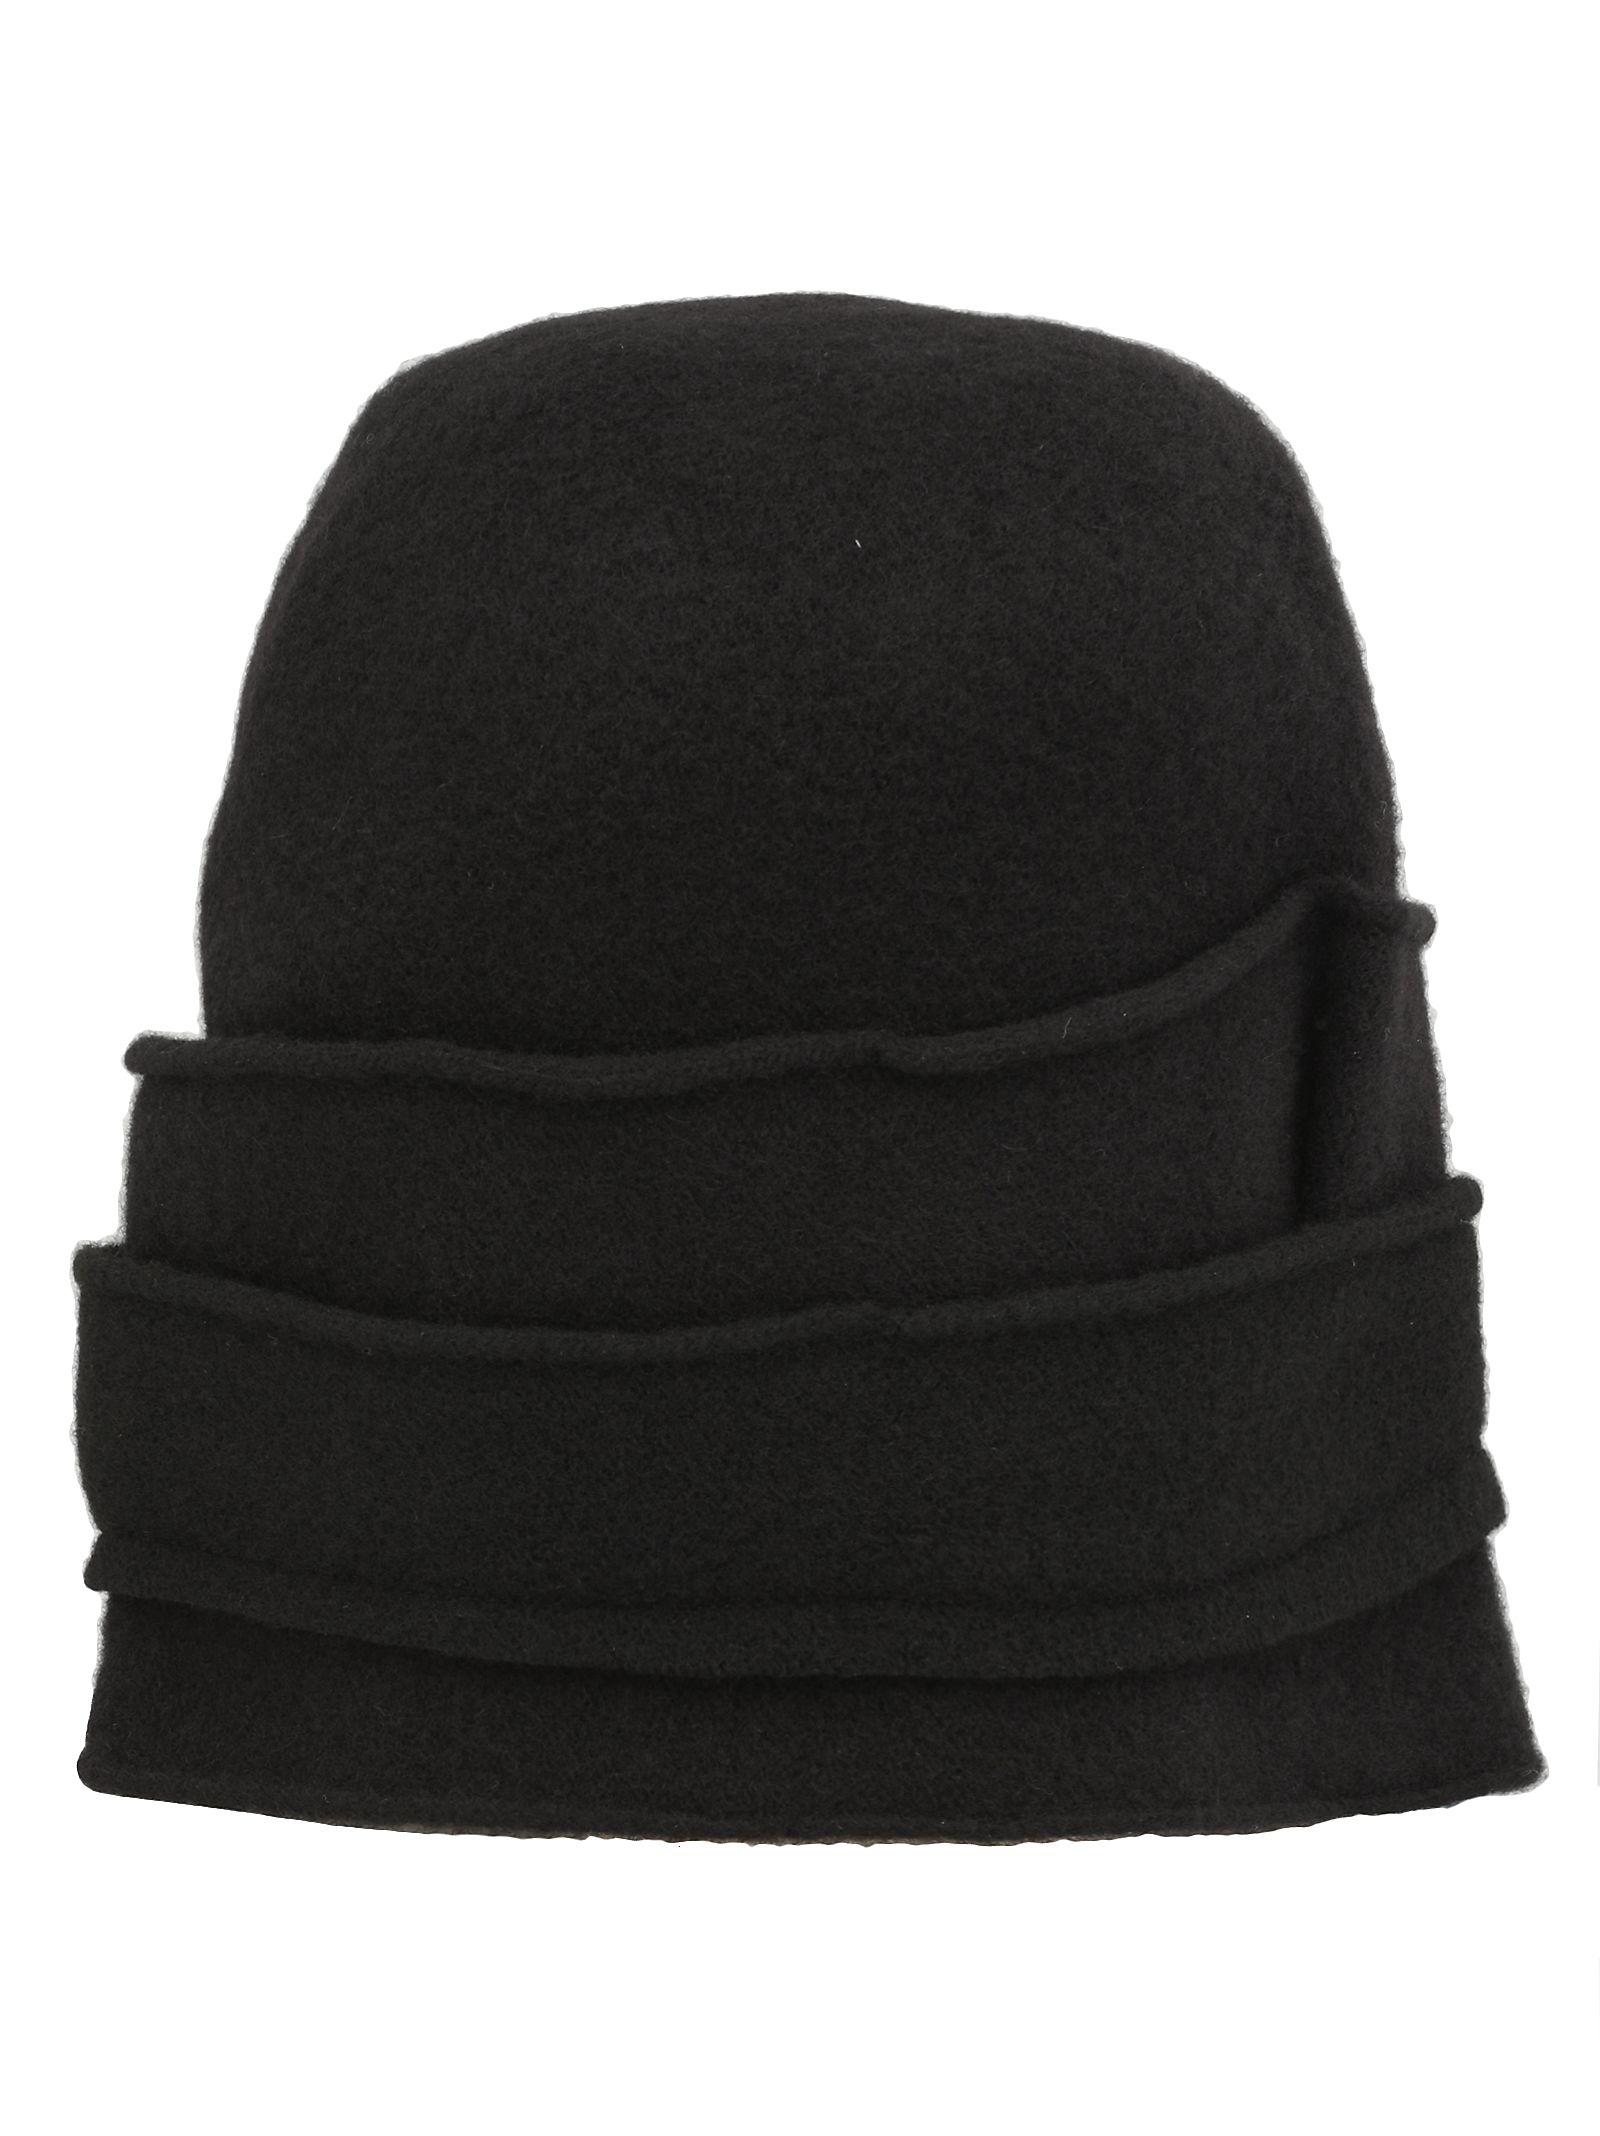 SCHA Crown Medium Hat in Black